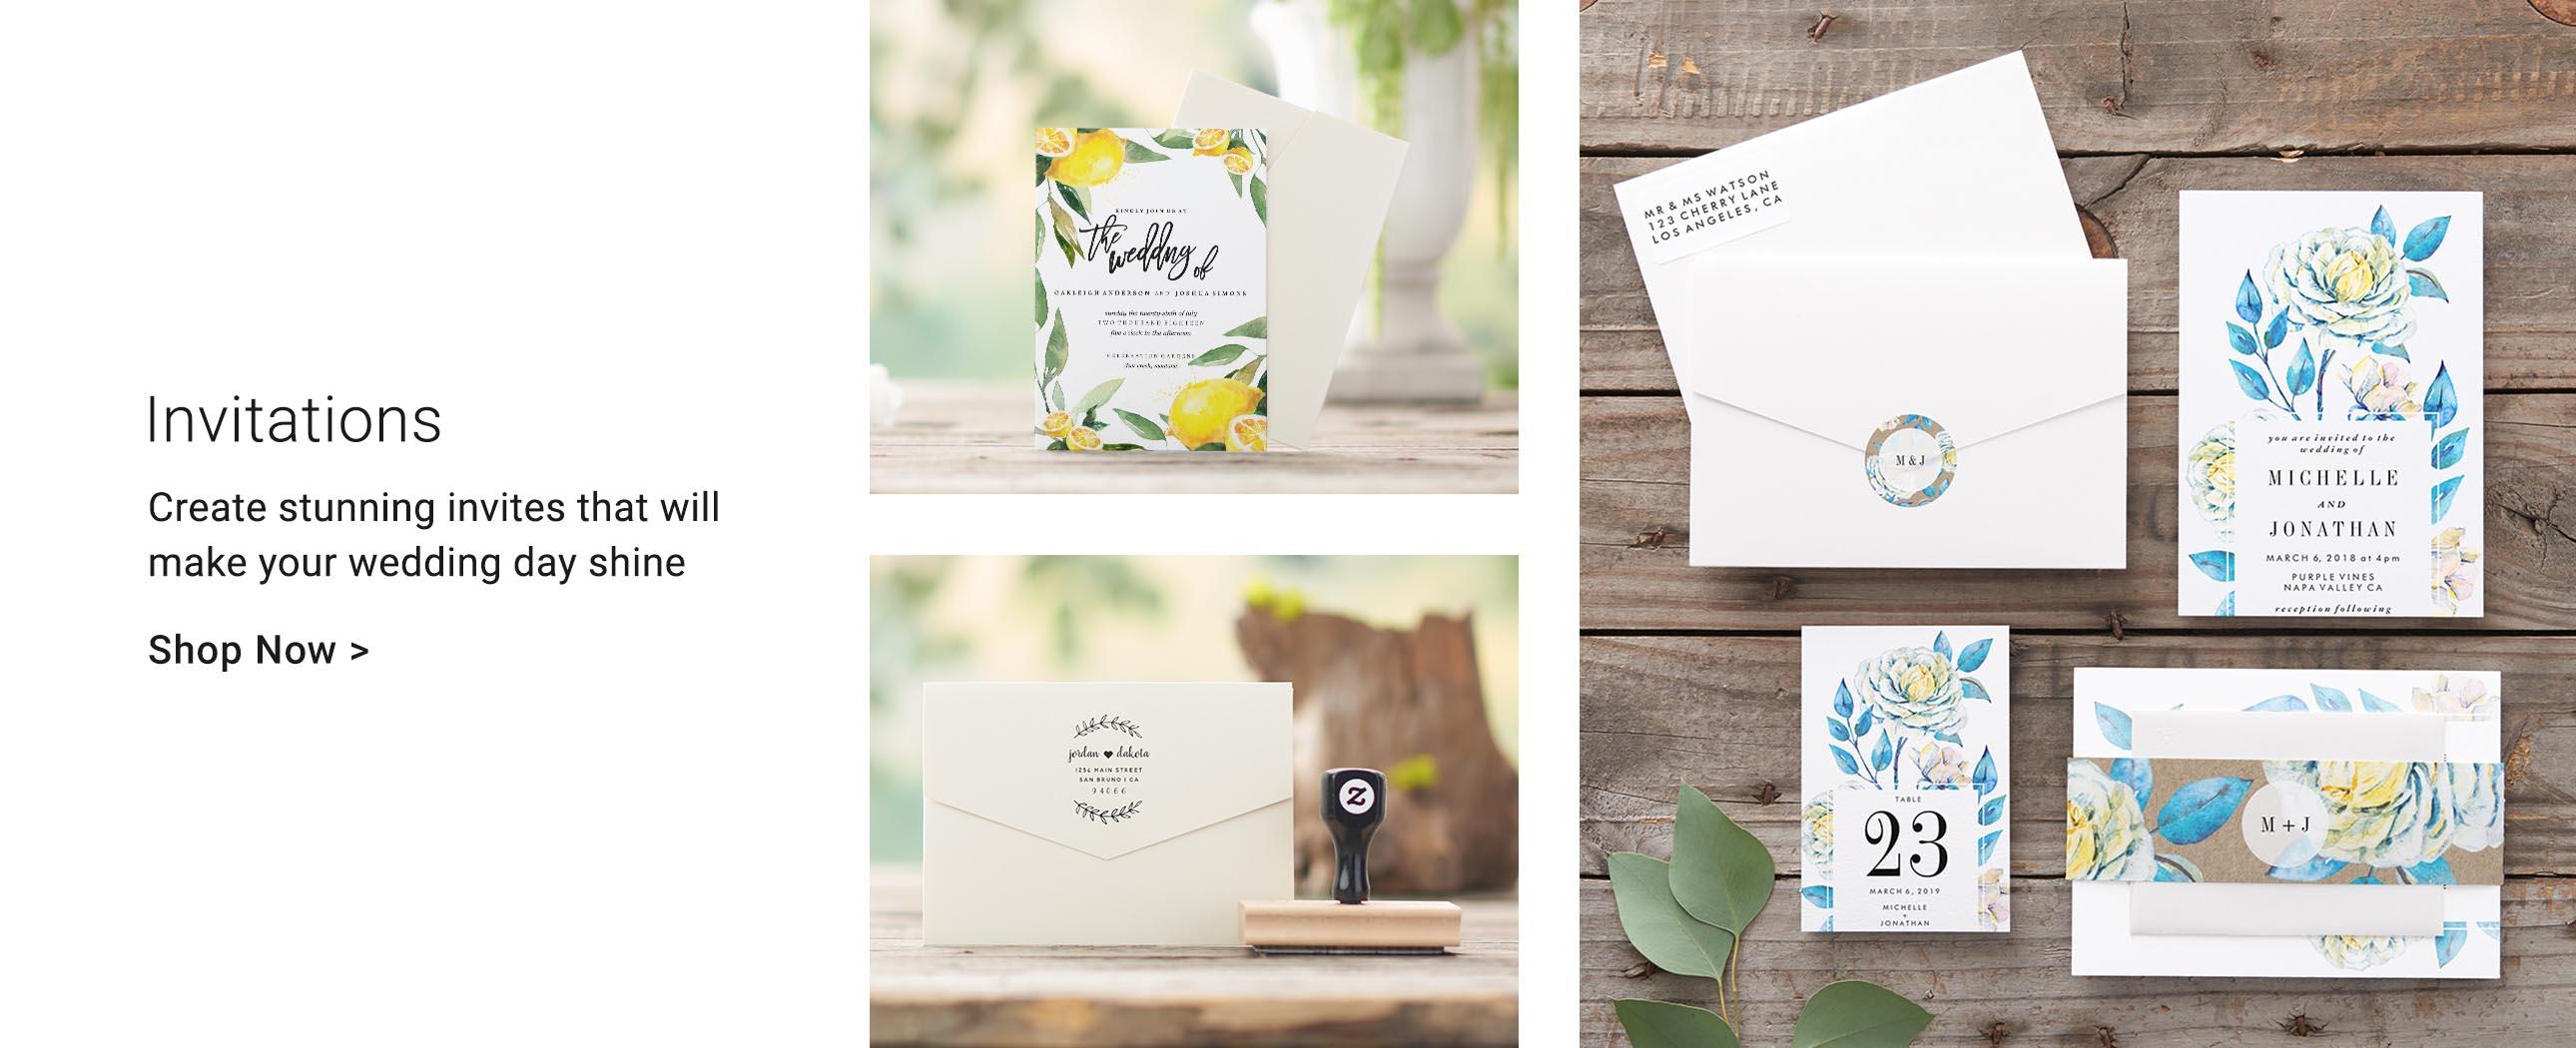 Personalized Wedding Gifts & Wedding Supplies | Zazzle